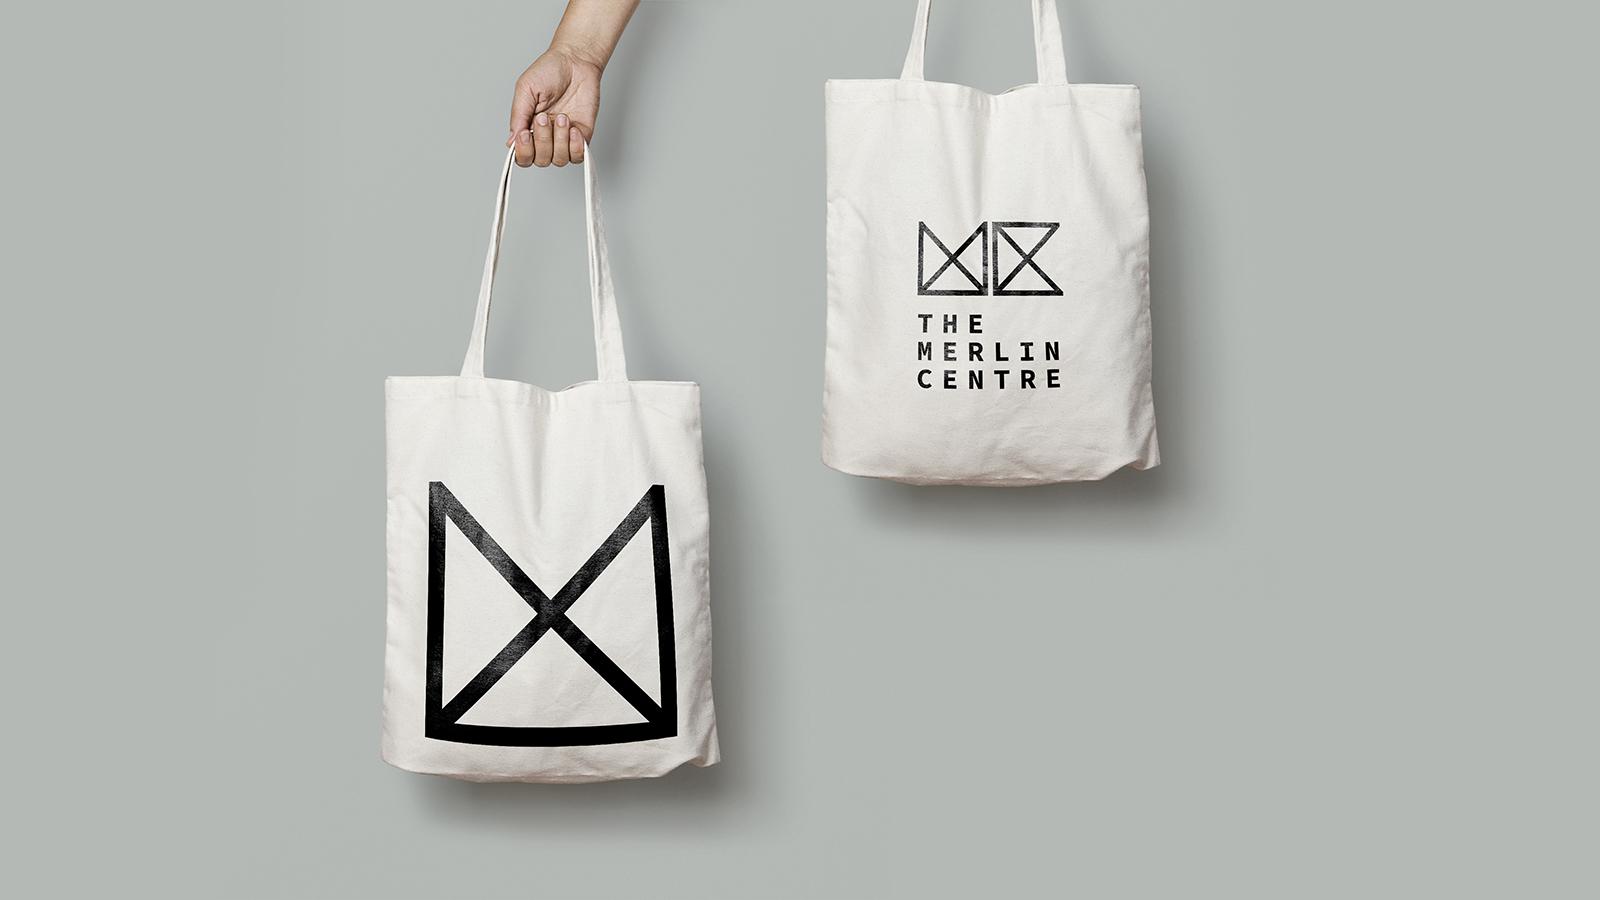 Branding-and-marketing-ALSO_Agency-Merlin-Centre-02.jpg